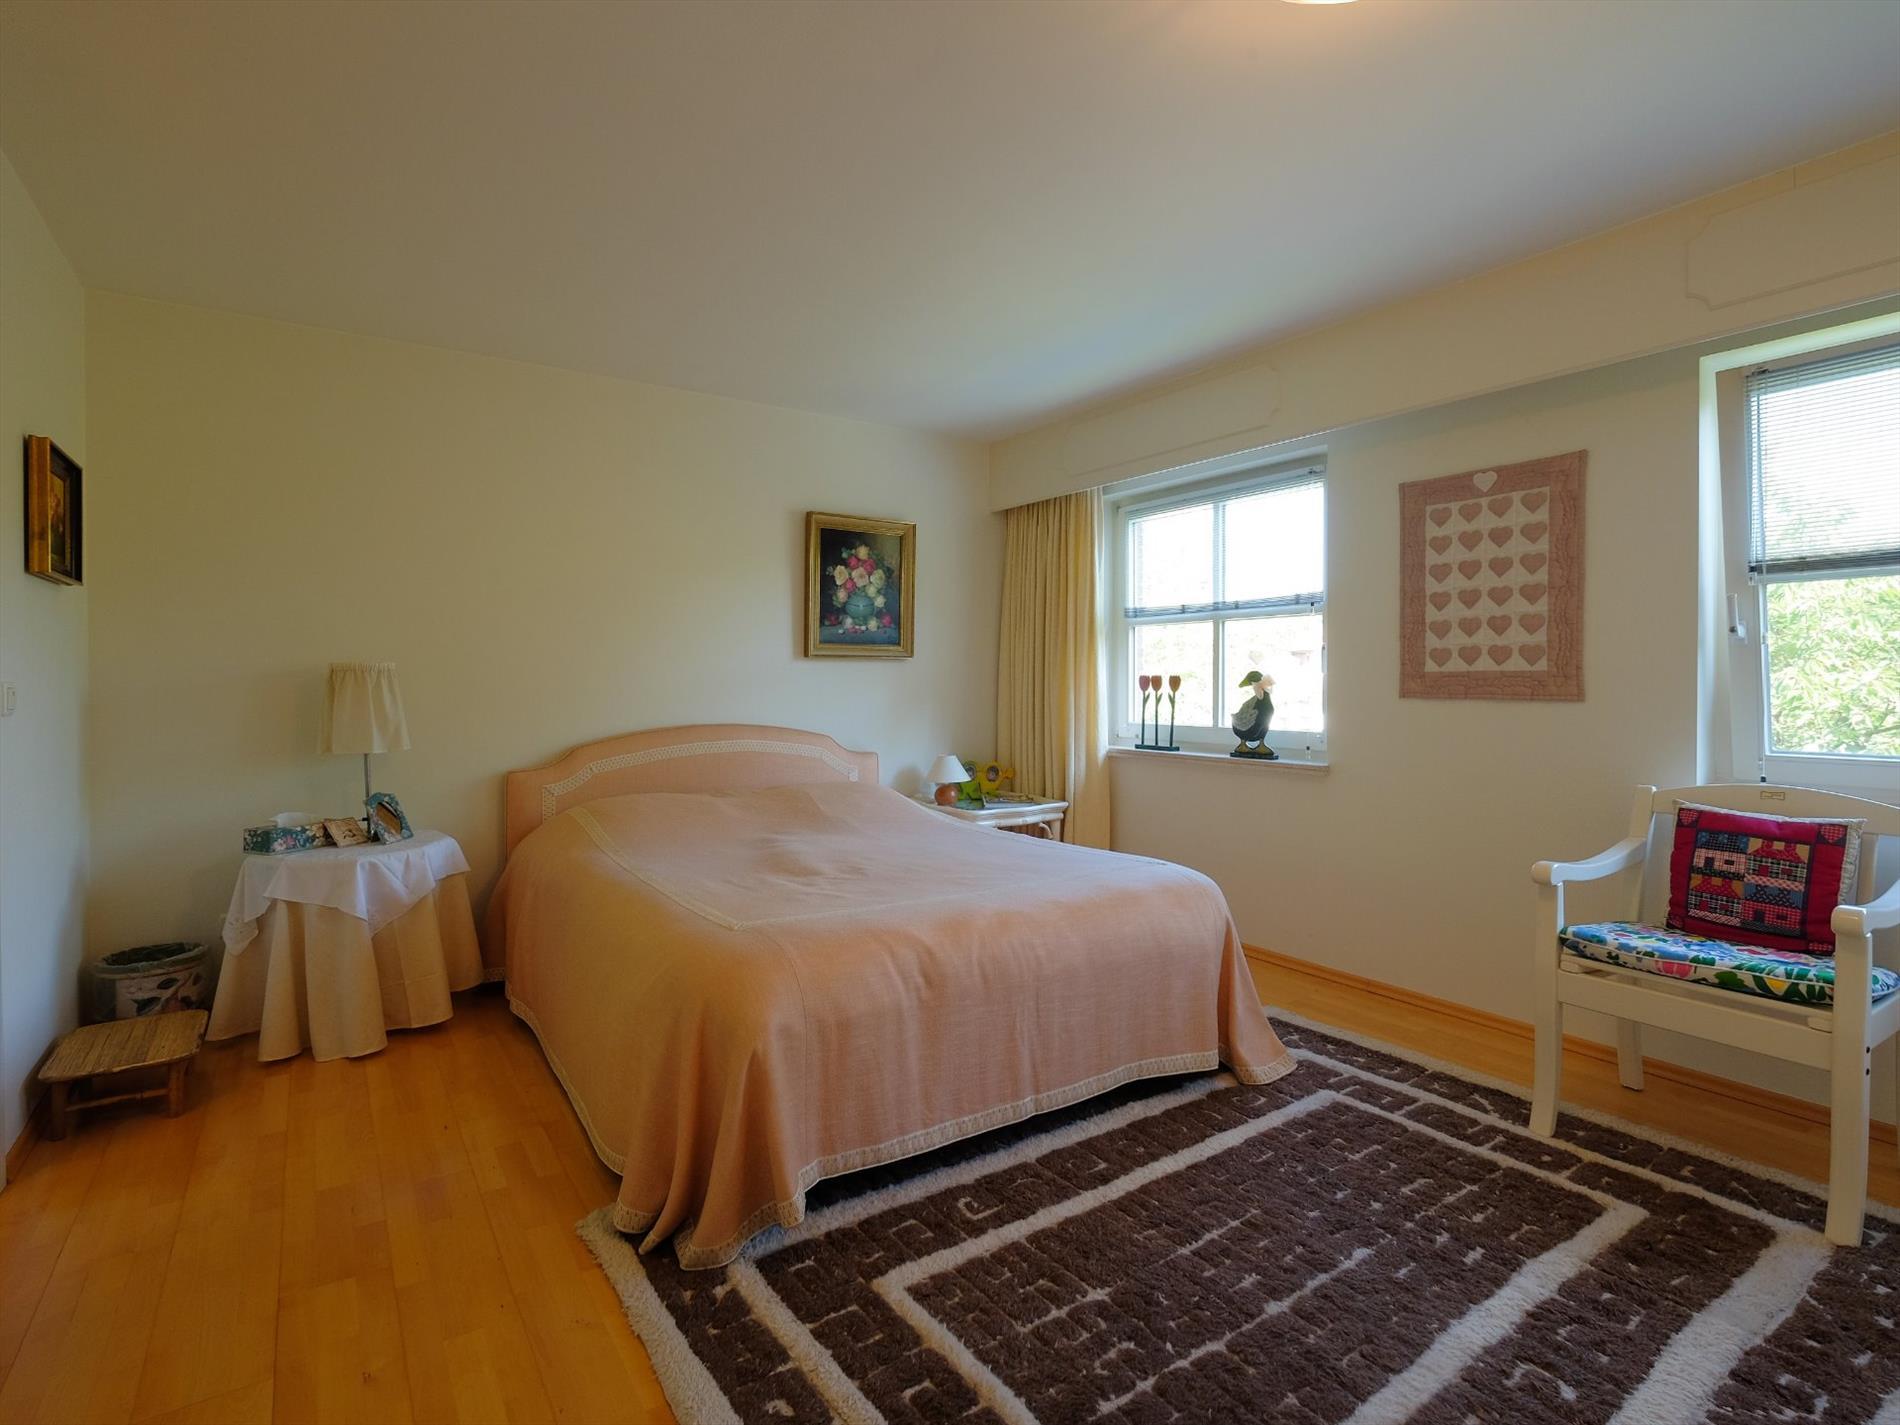 Eigentijdse villa met 4 slaapkamers 2 badkamers op zonnig perceel